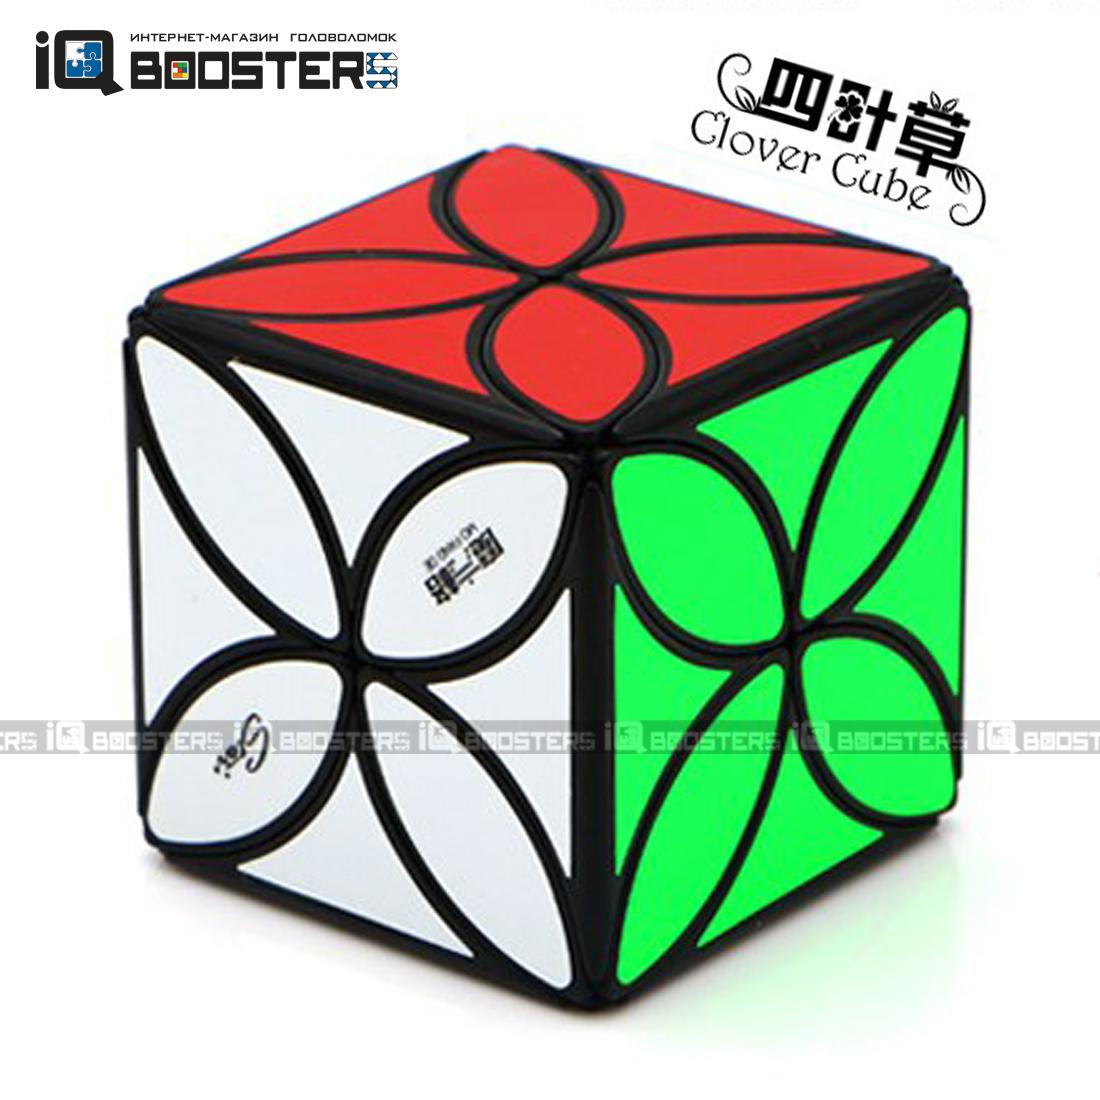 qiyi_clover_cube_b1